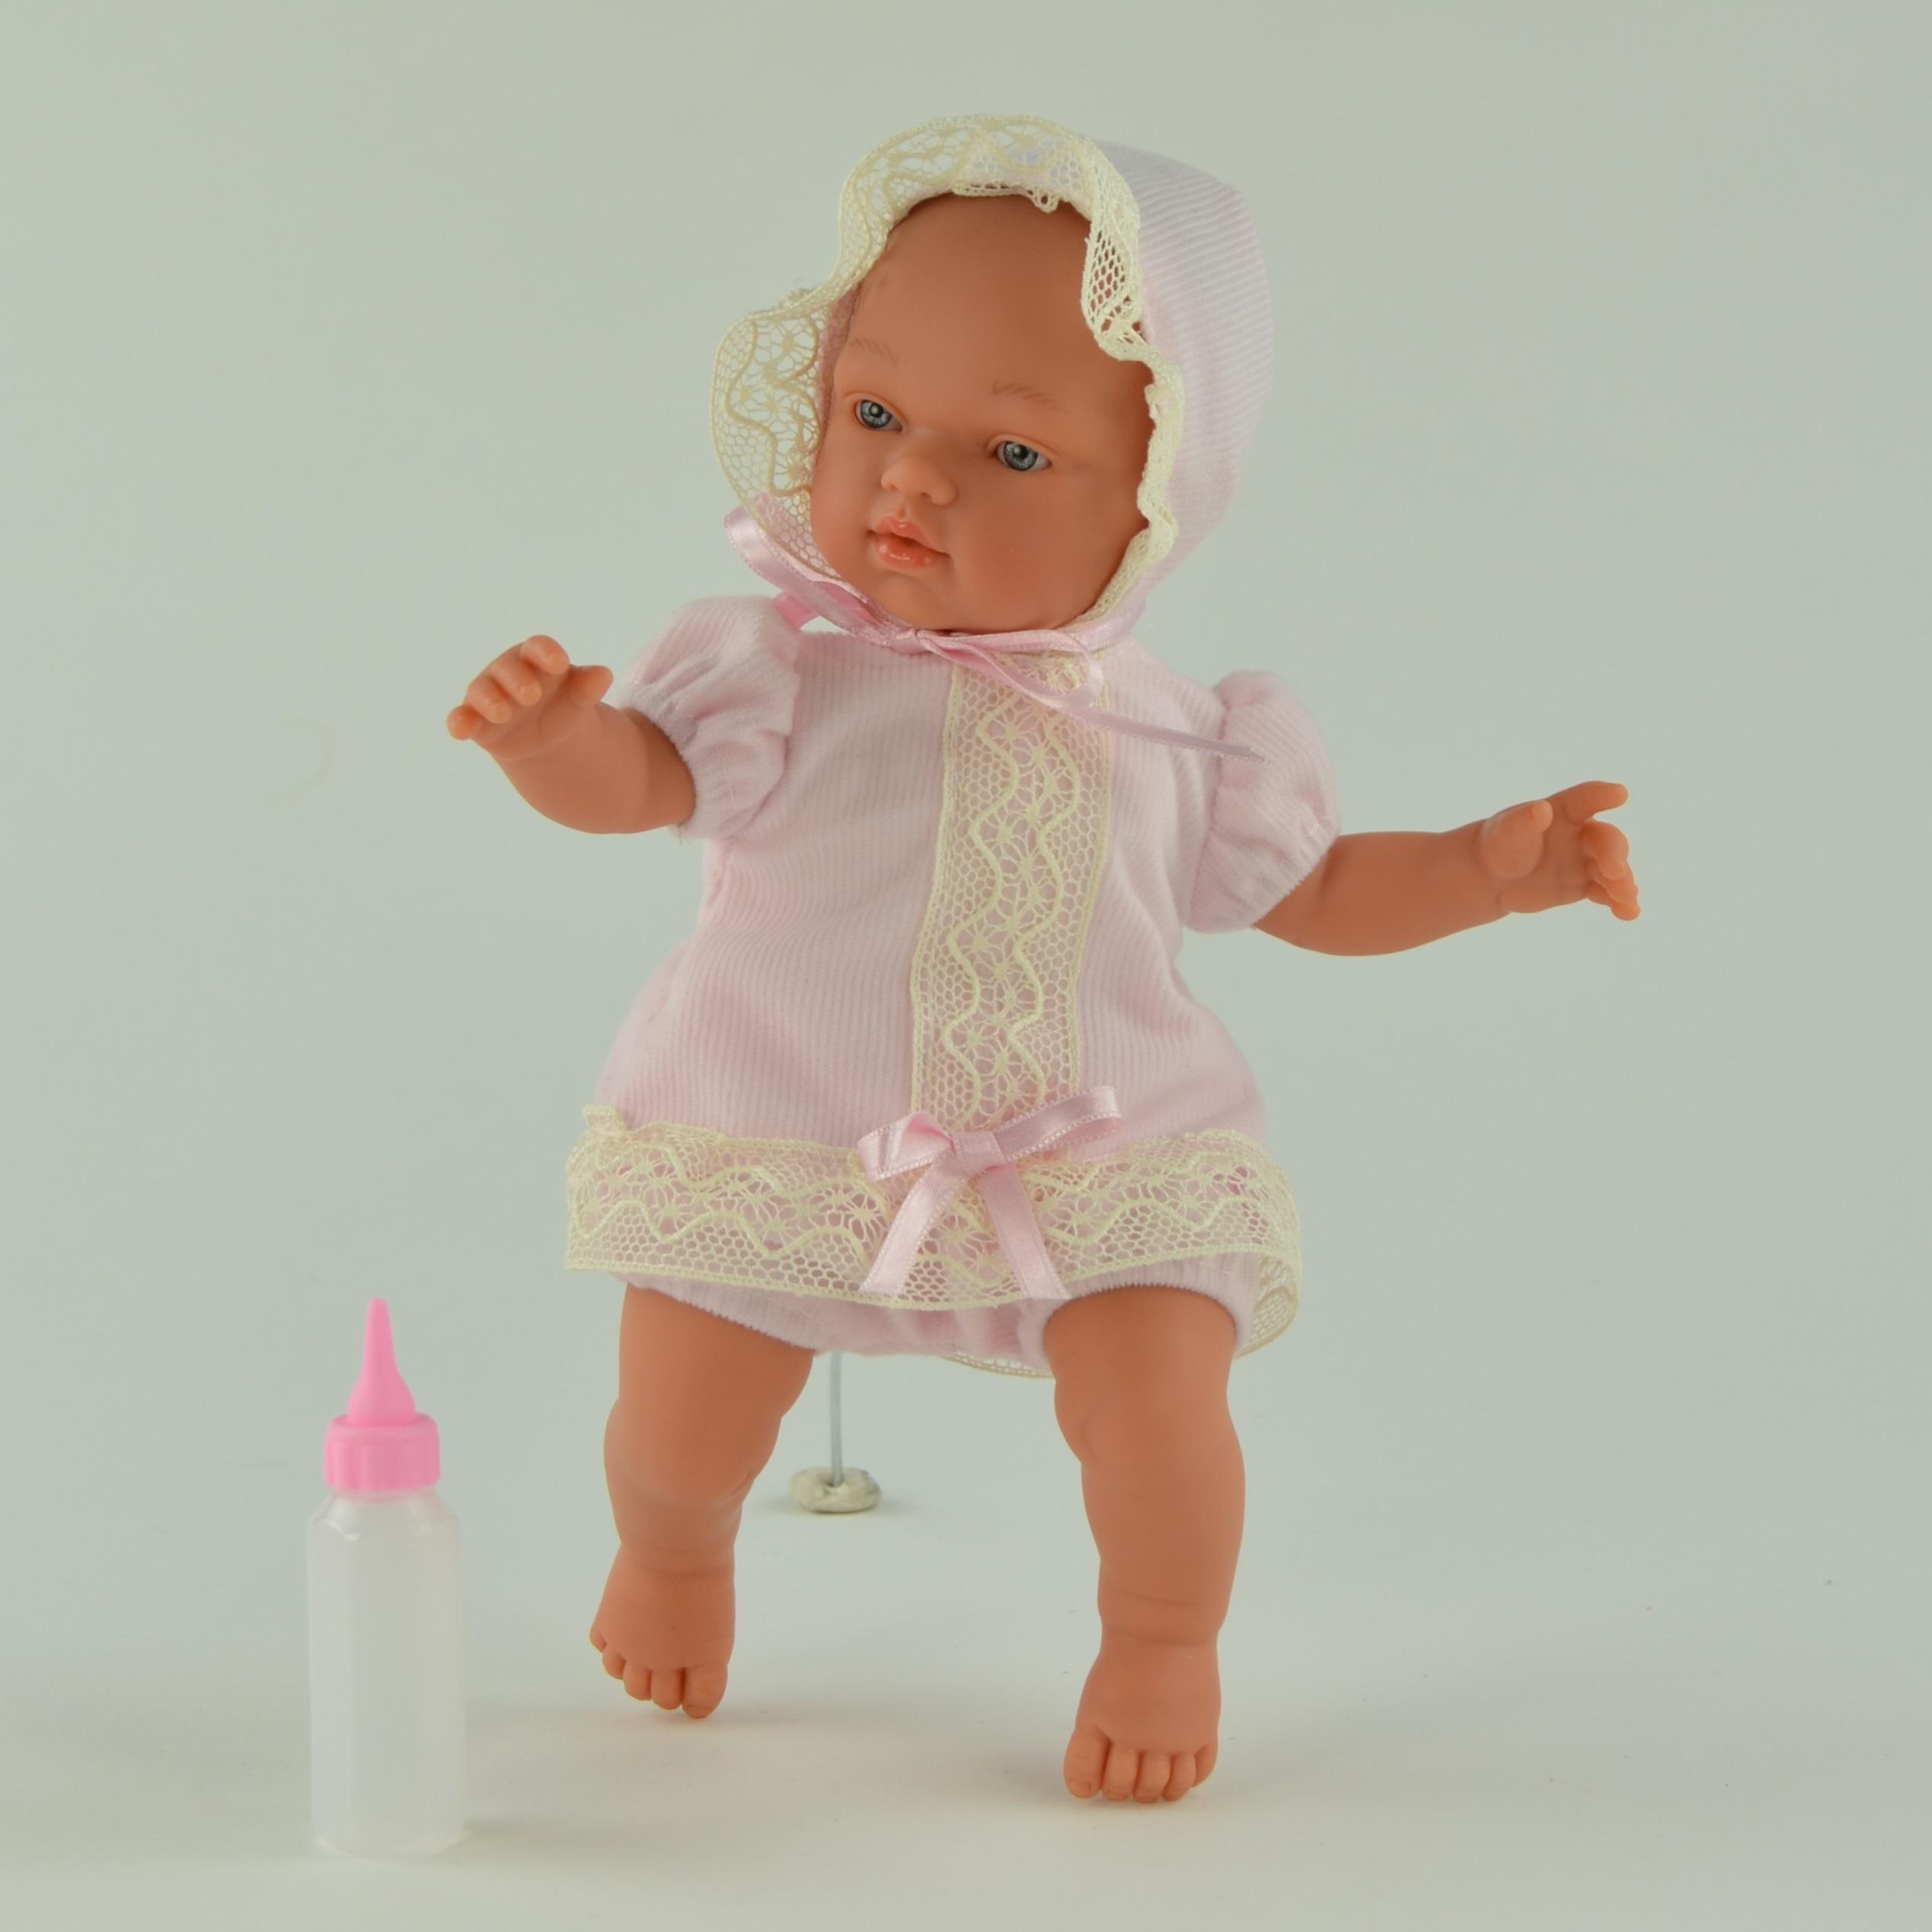 Кукла Гугу в розовом костюмчике с бутылочкой, 27 смКуклы ASI (Испания)<br>Кукла Гугу в розовом костюмчике с бутылочкой, 27 см<br>